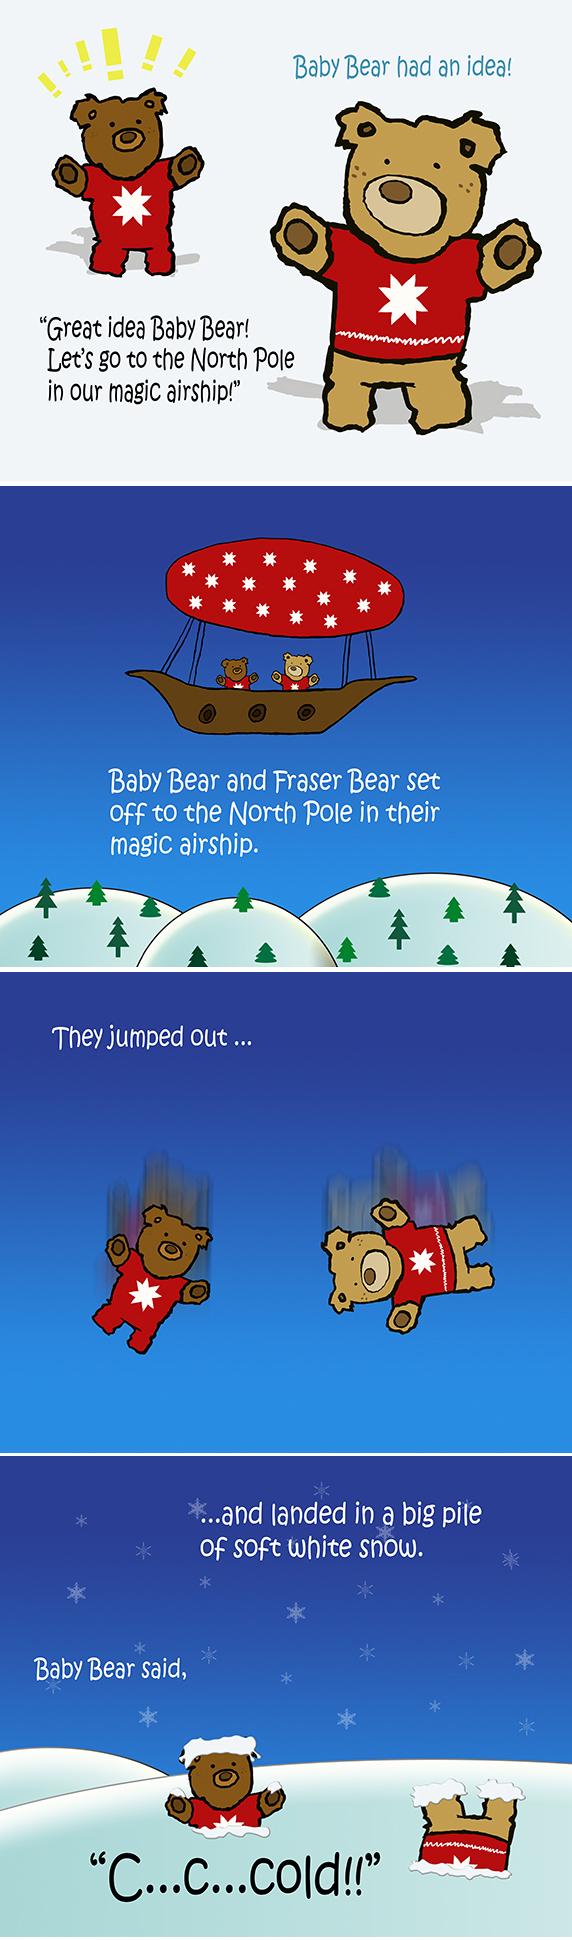 Snow Story Ending